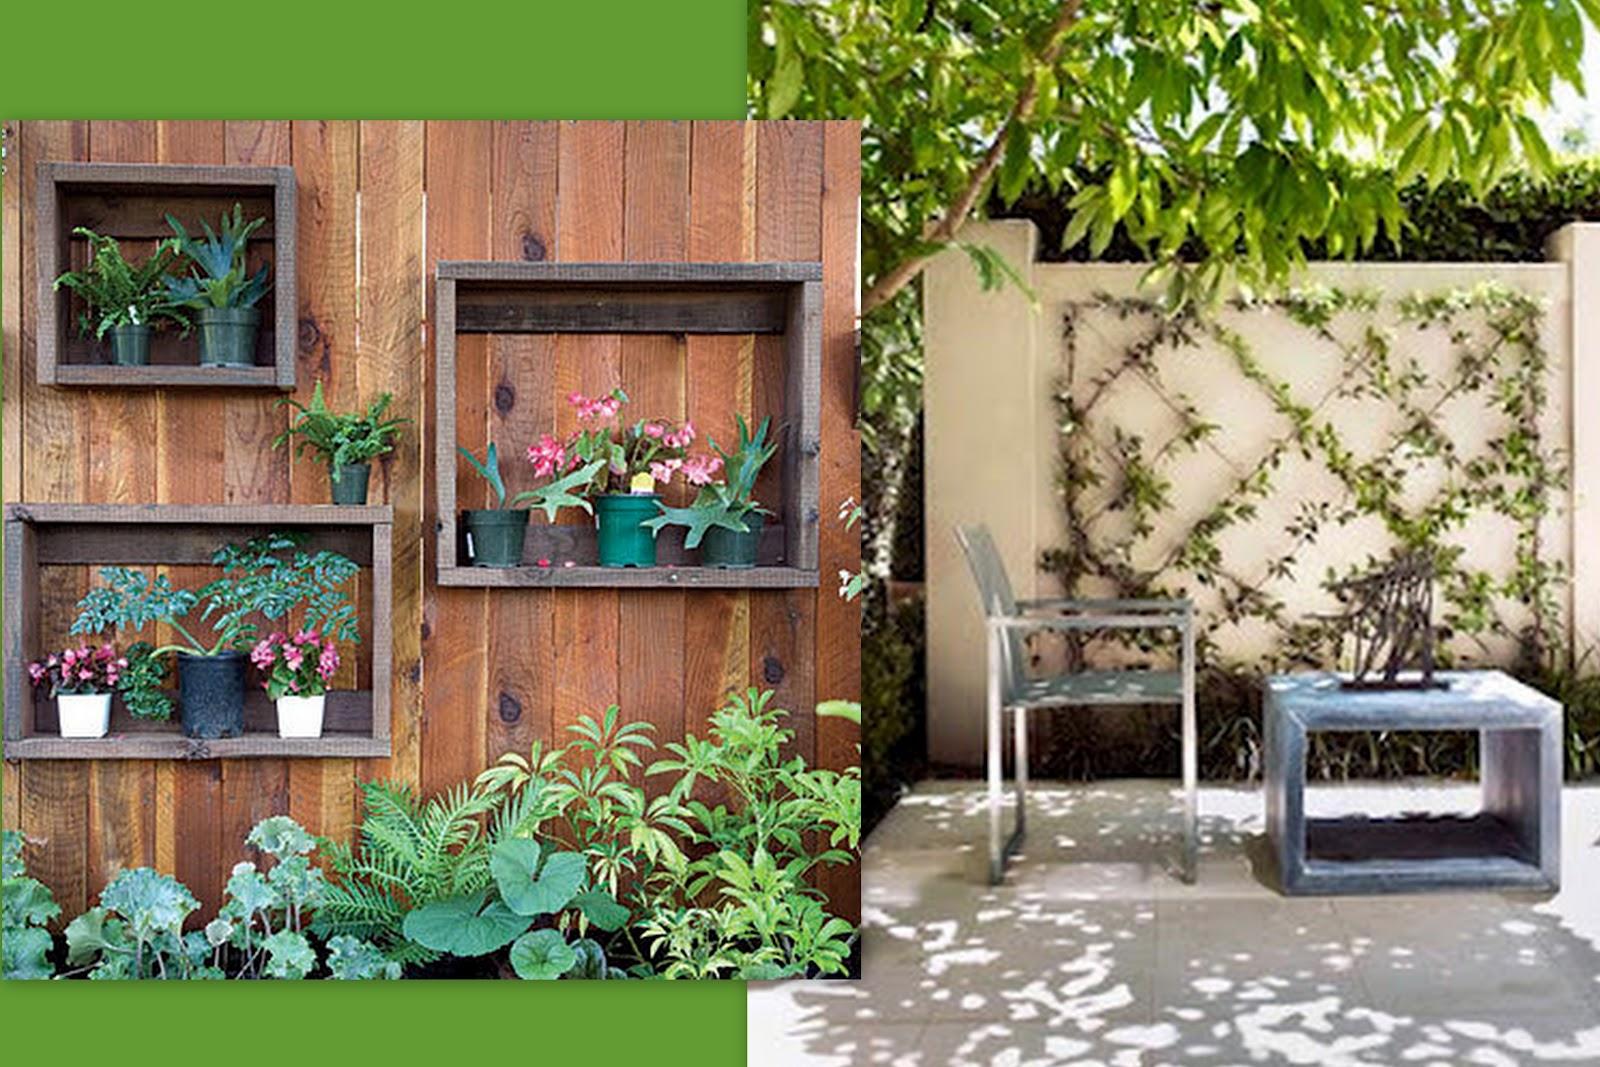 ideias baratas para jardim vertical : ideias baratas para jardim vertical: de seguida vários exemplos e ideias de como fazer um jardim vertical